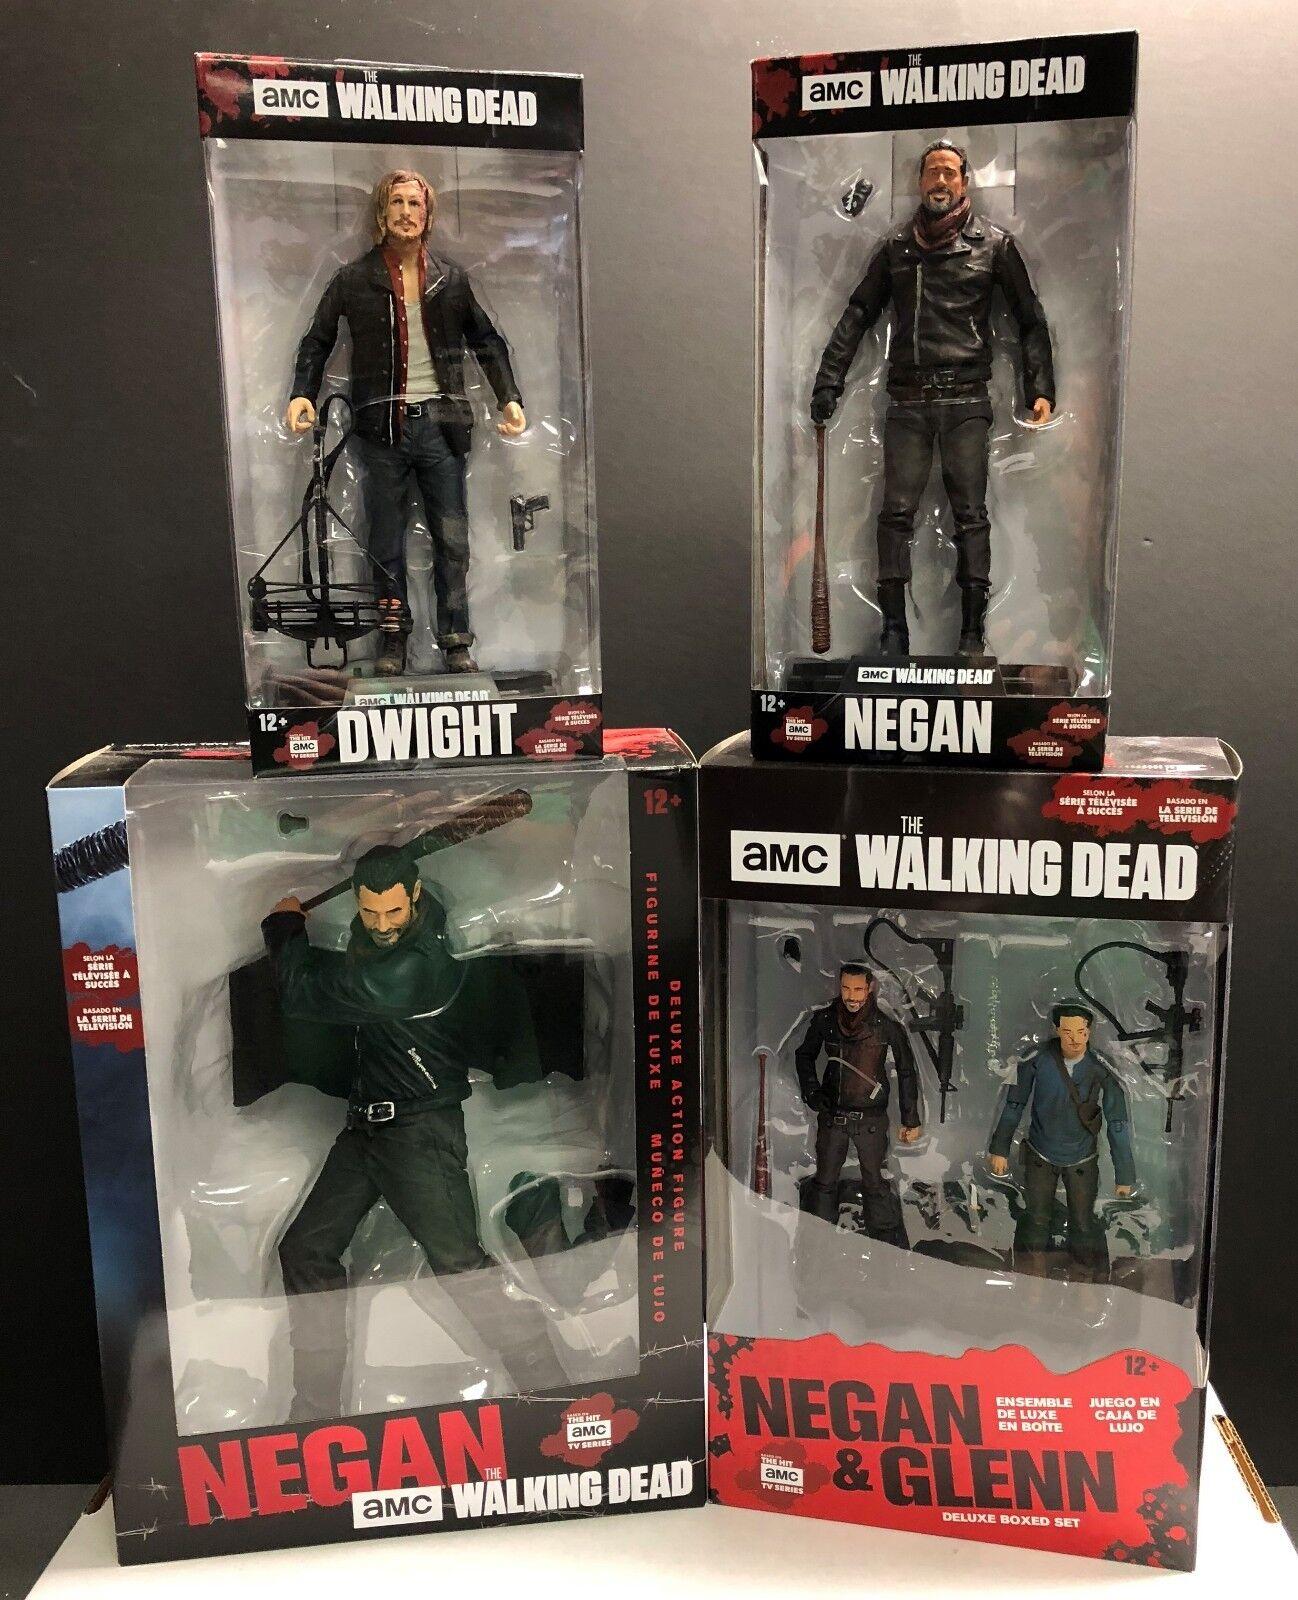 McFarlane Toys Toys Toys Walking Dead Negan Collection Set of 4 Dwight Glenn Negan NIB 40561e